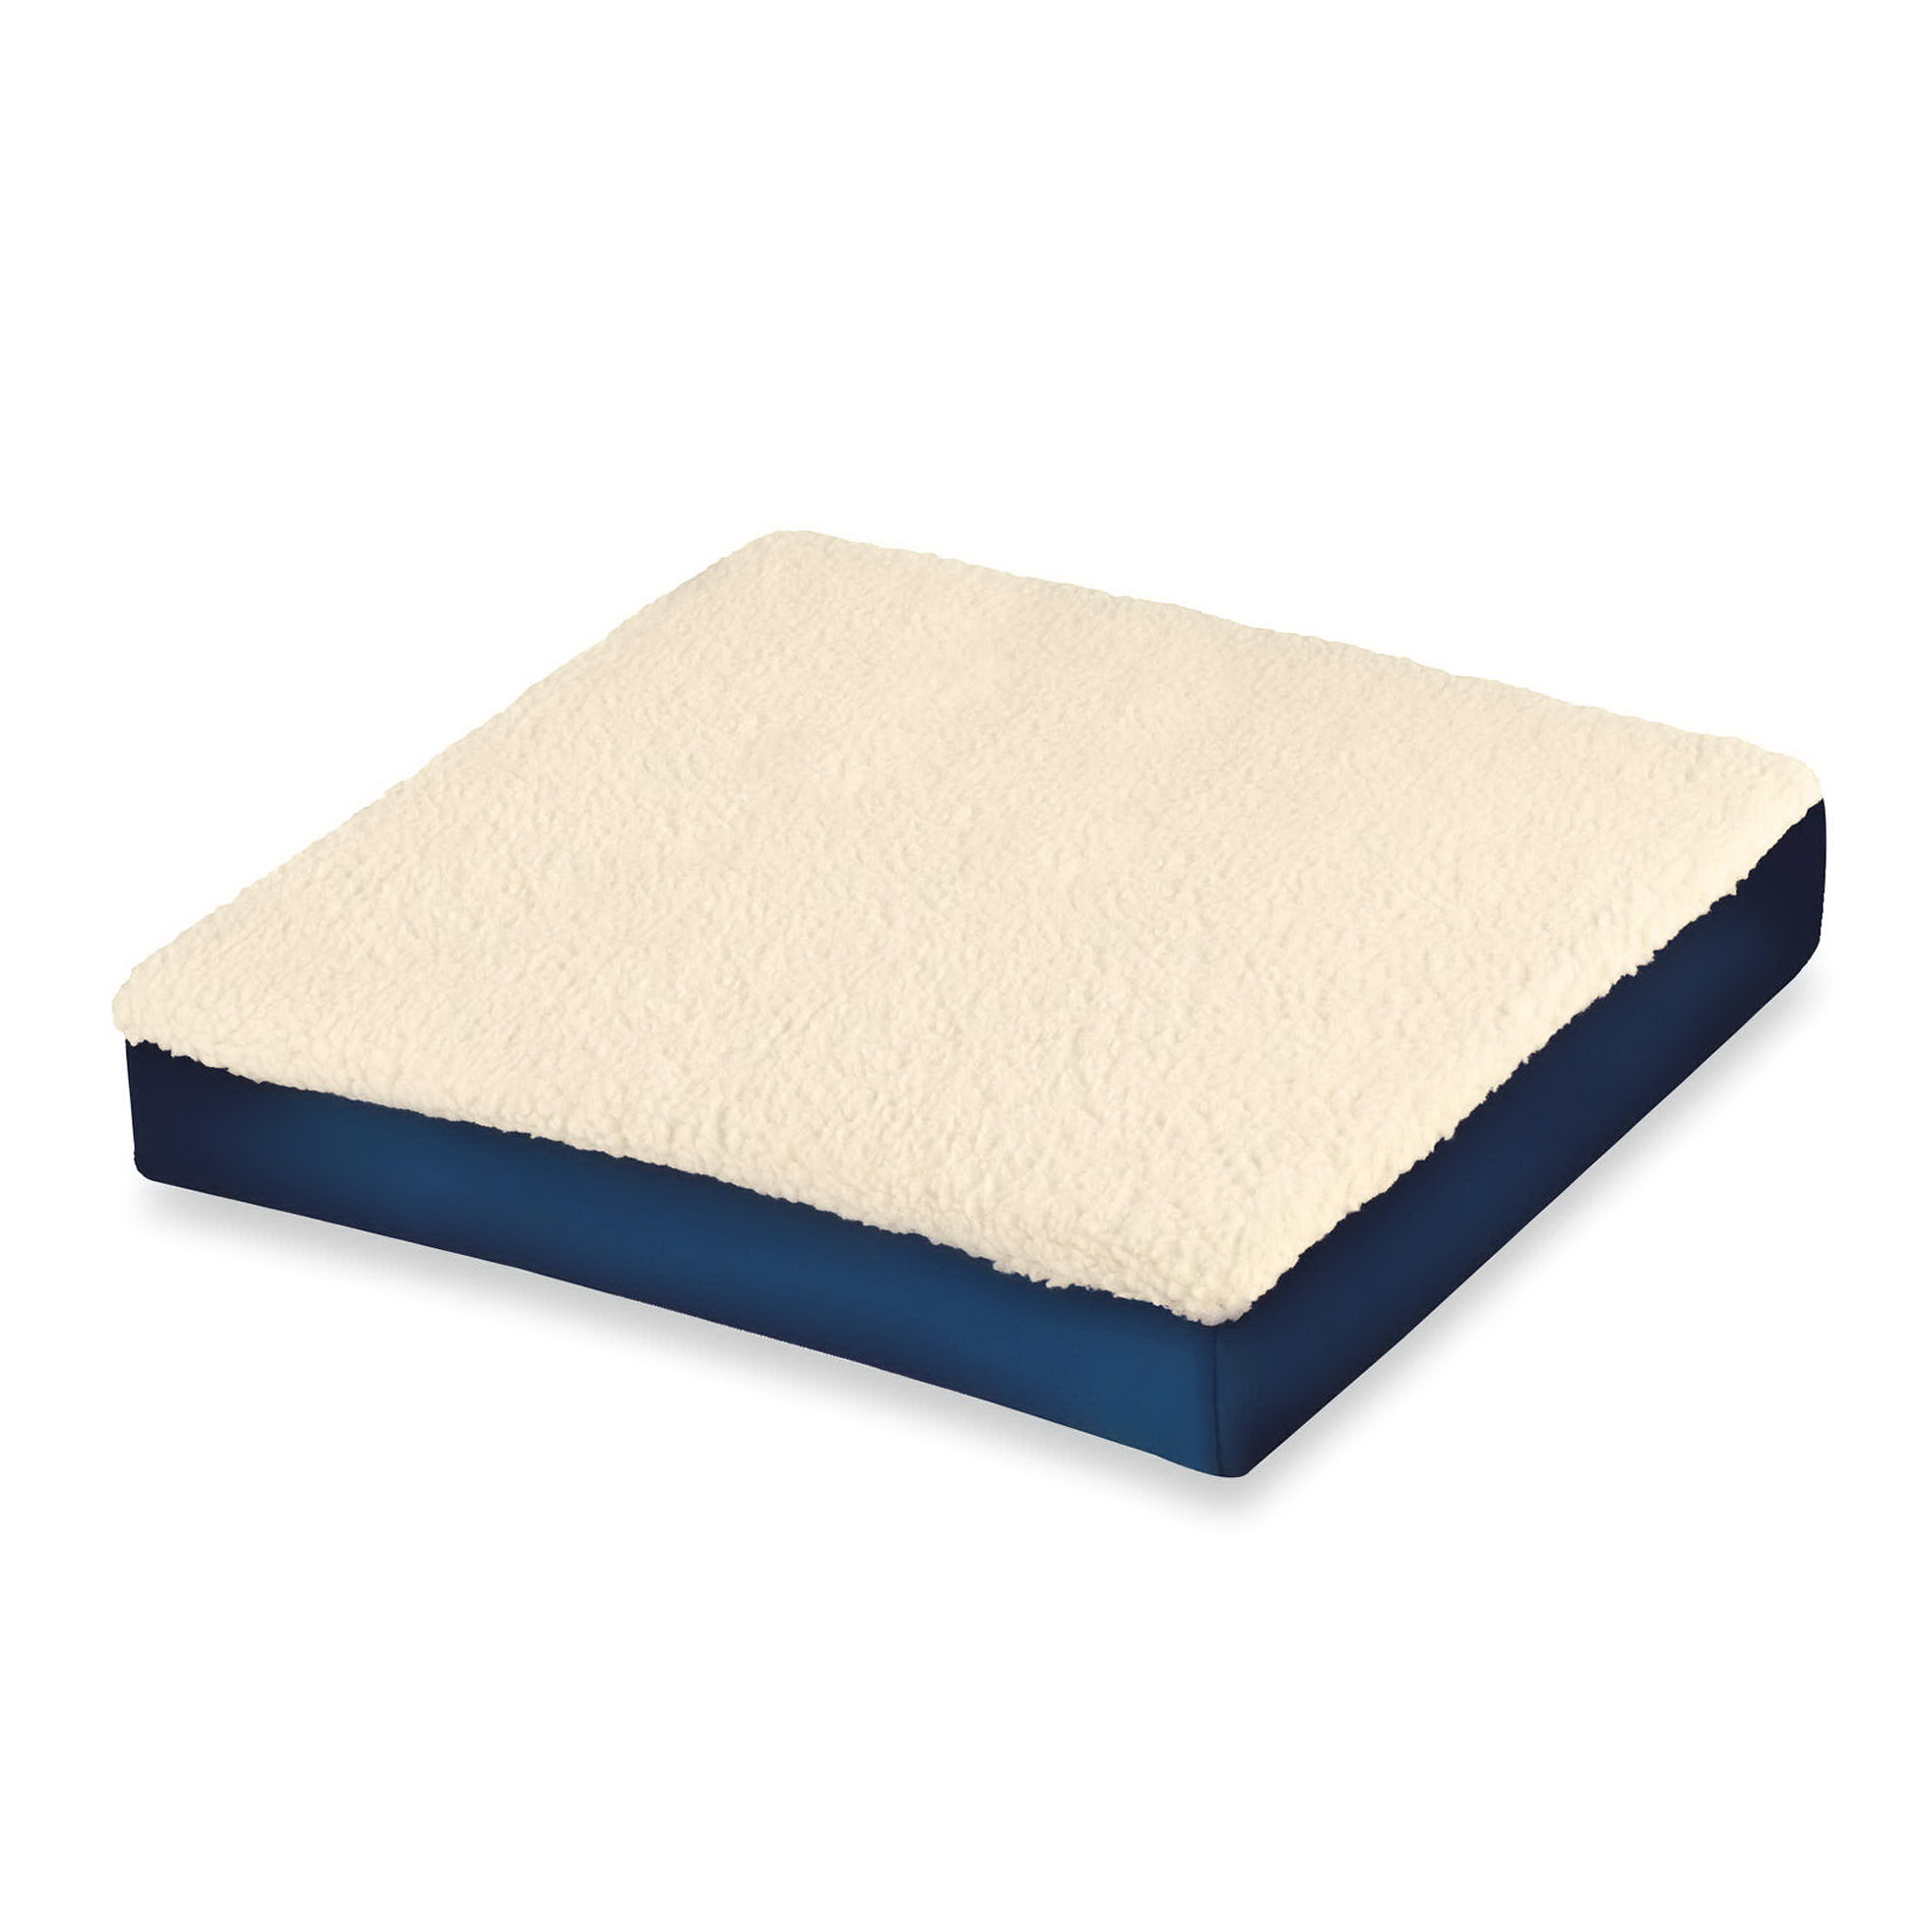 memory foam chair cushion as seen on tv home design ideas. Black Bedroom Furniture Sets. Home Design Ideas